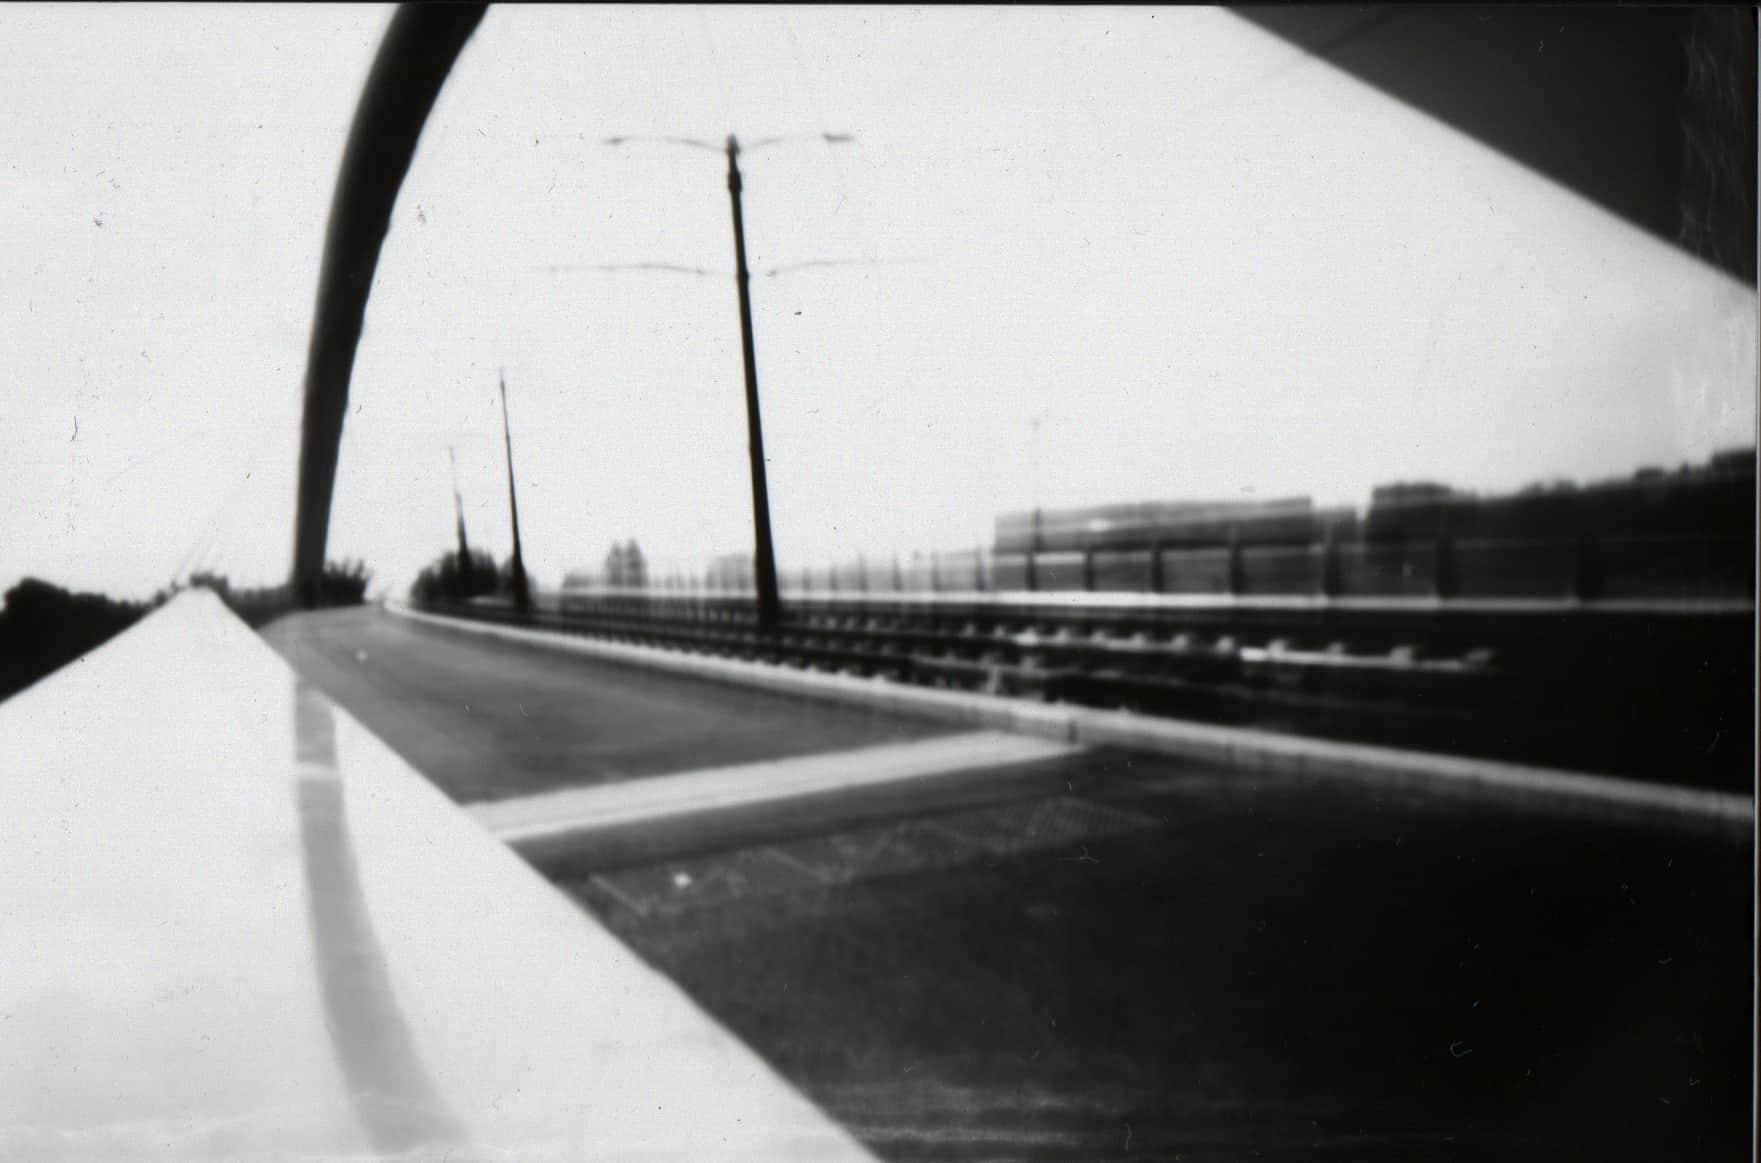 photos-stenope-negatif-de-linterieur-de-la-coop-a-strasbourg